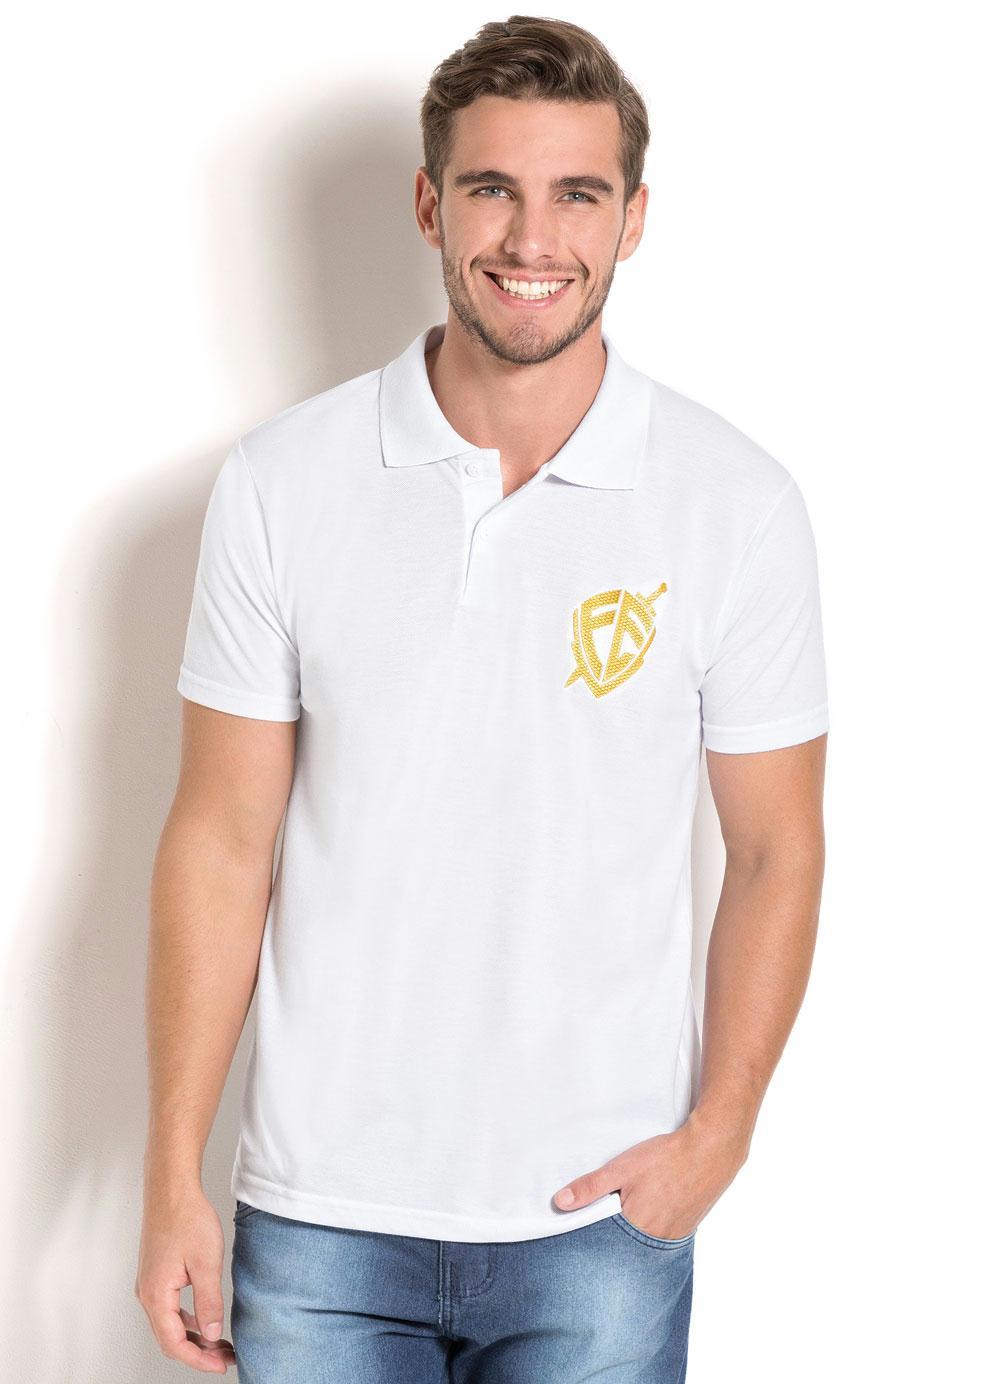 Camisa Polo Branca com Estampa - Queima de Estoque 27cfa310b1efa